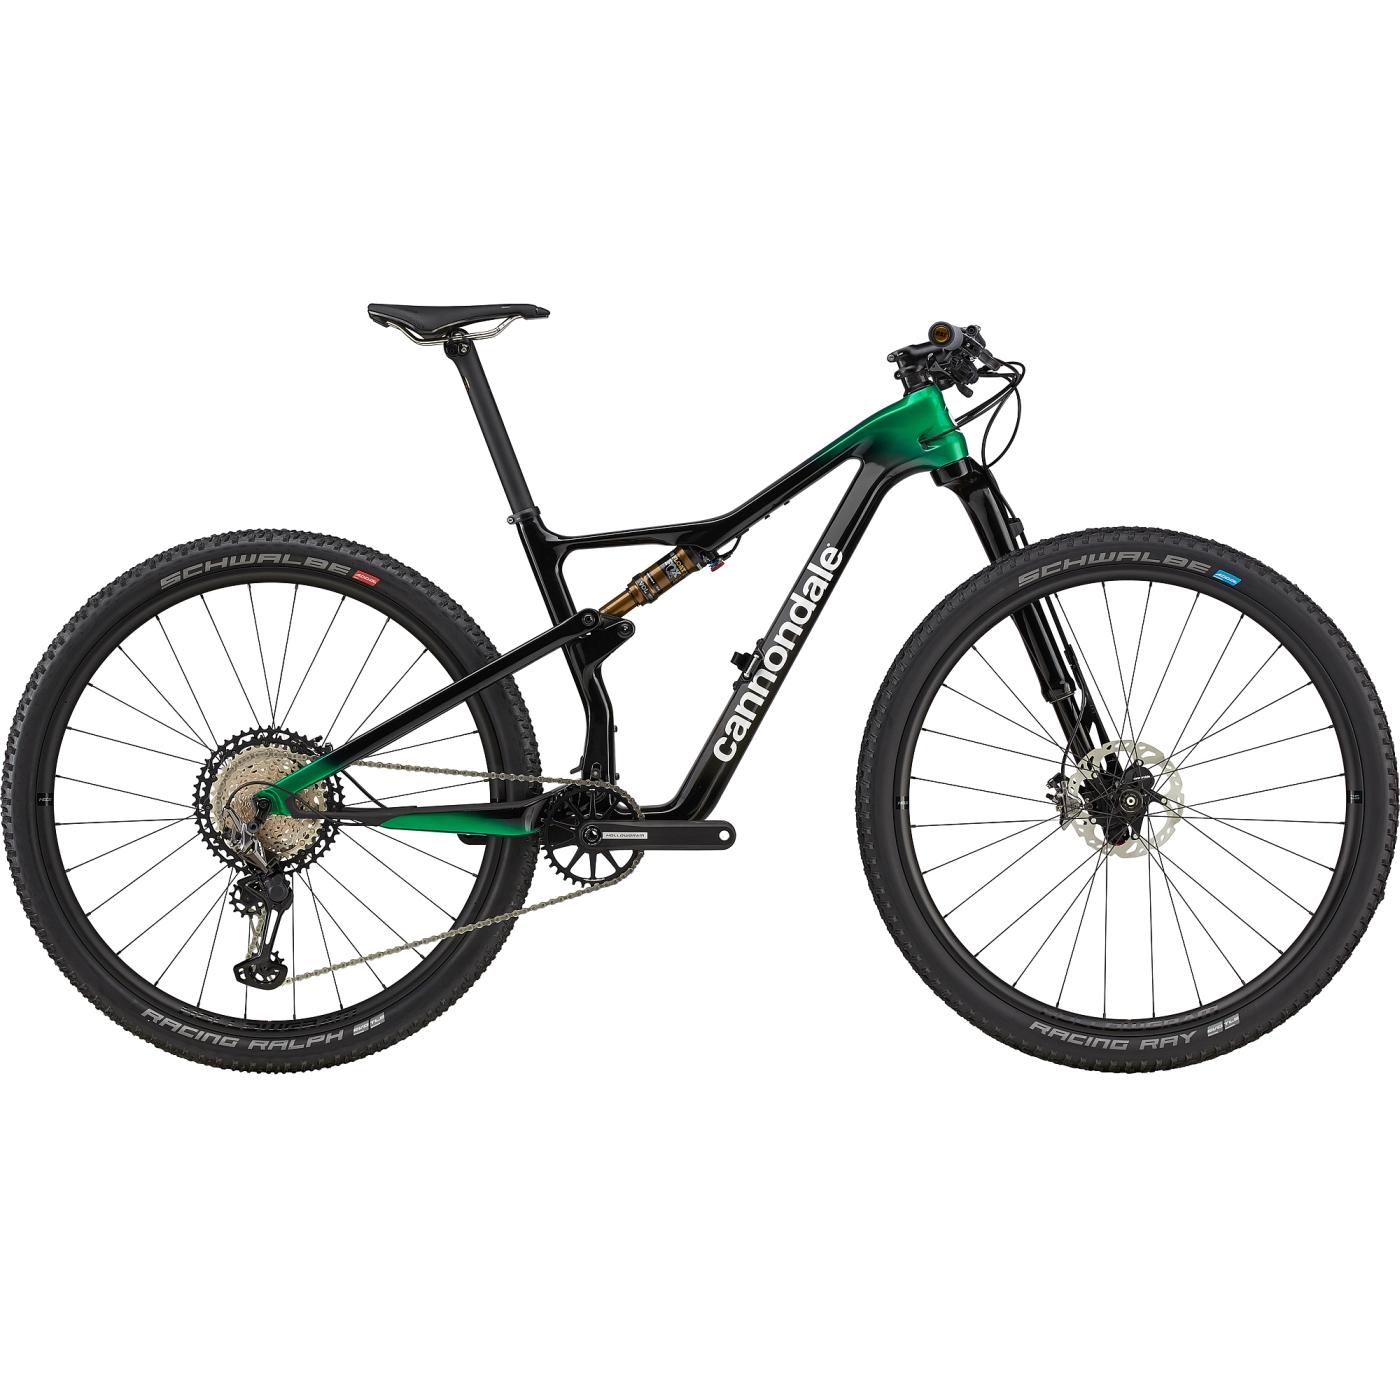 "Cannondale SCALPEL Hi-MOD CARBON 1 - 29"" Mountainbike - 2021 - Team Replica Carbon / Cannondale Green"